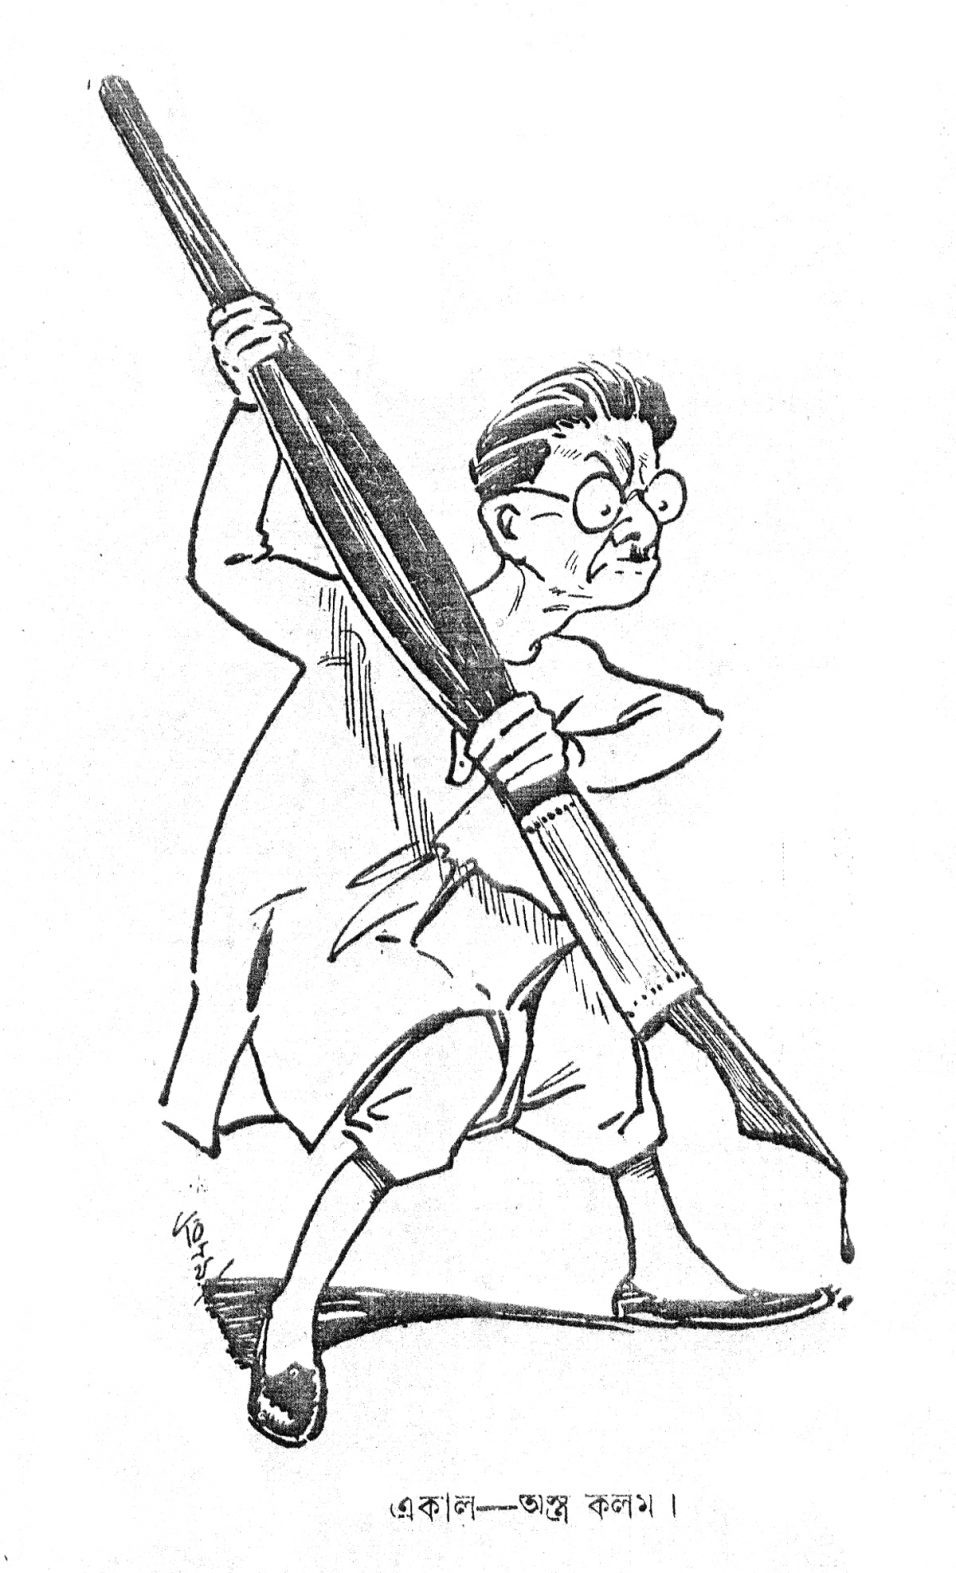 Cartoonpattor_Binoy Bosu 3